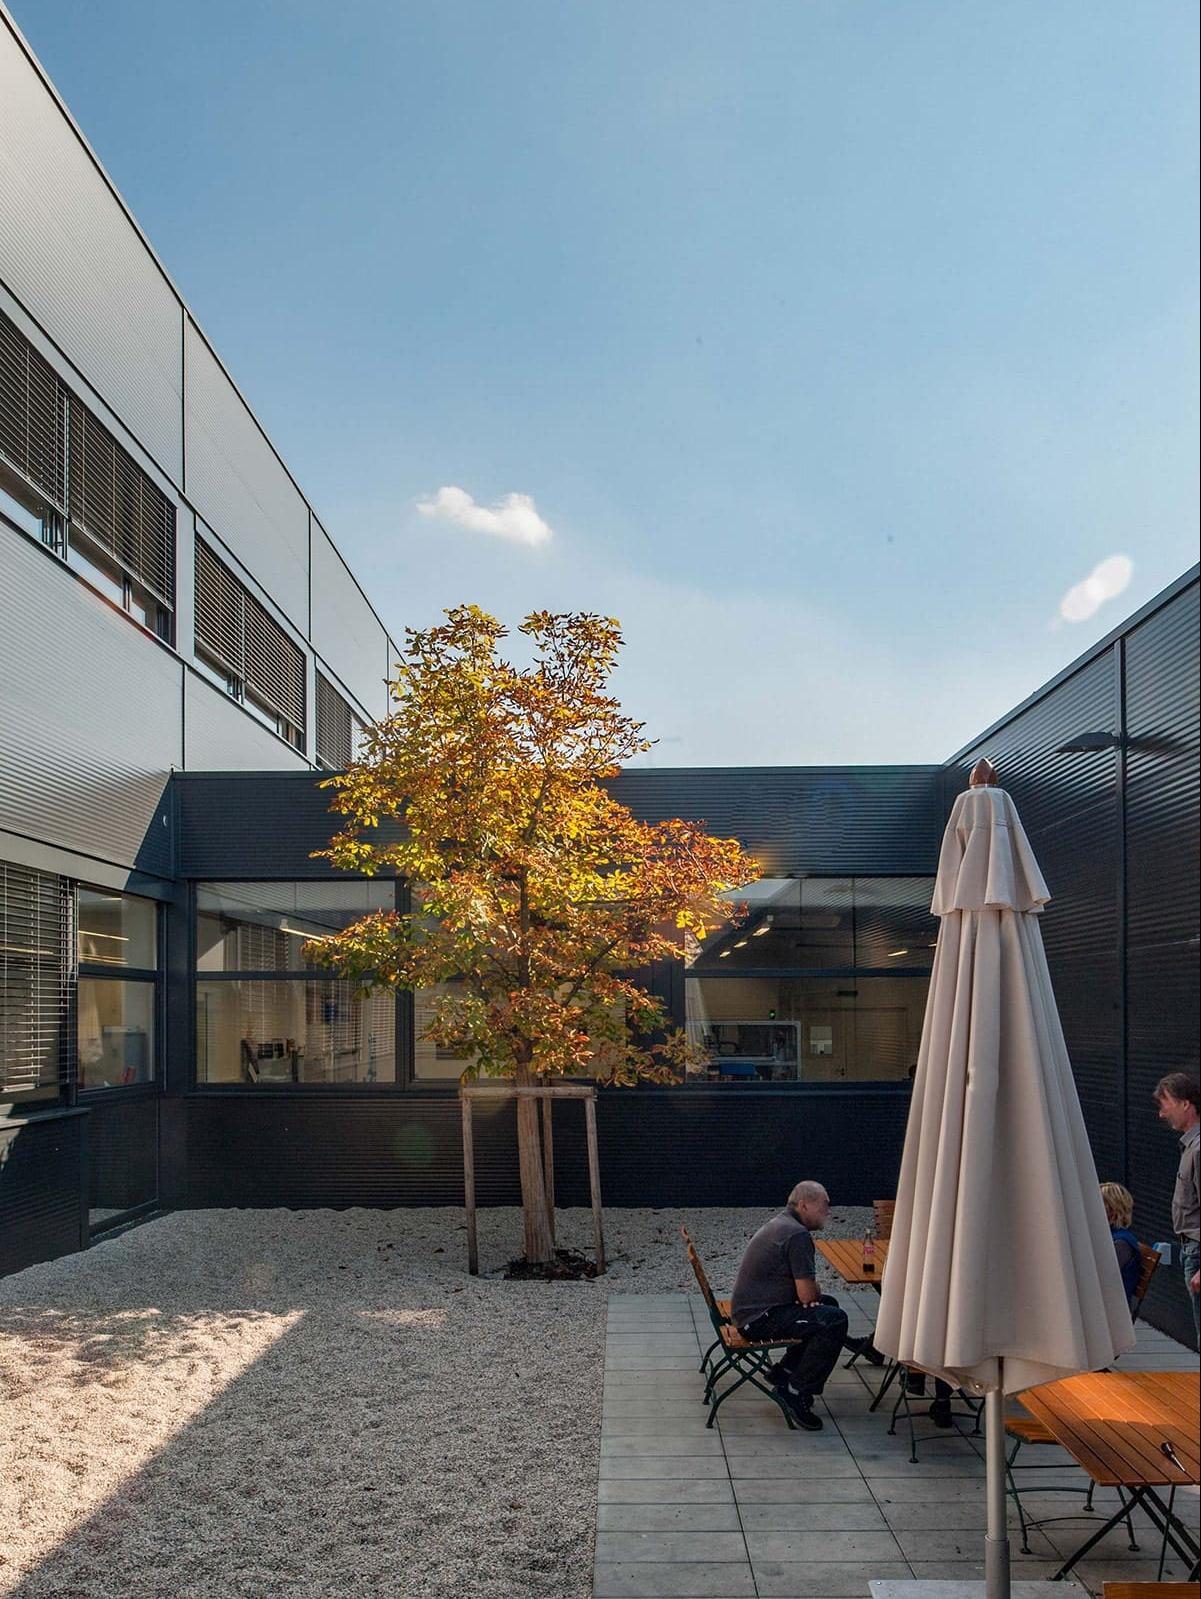 Innenhof, Neubau, Firma, Architektur, Produktionsbetrieb, Peaktechnology, Holzhausen, Carbon, Kohlefaser